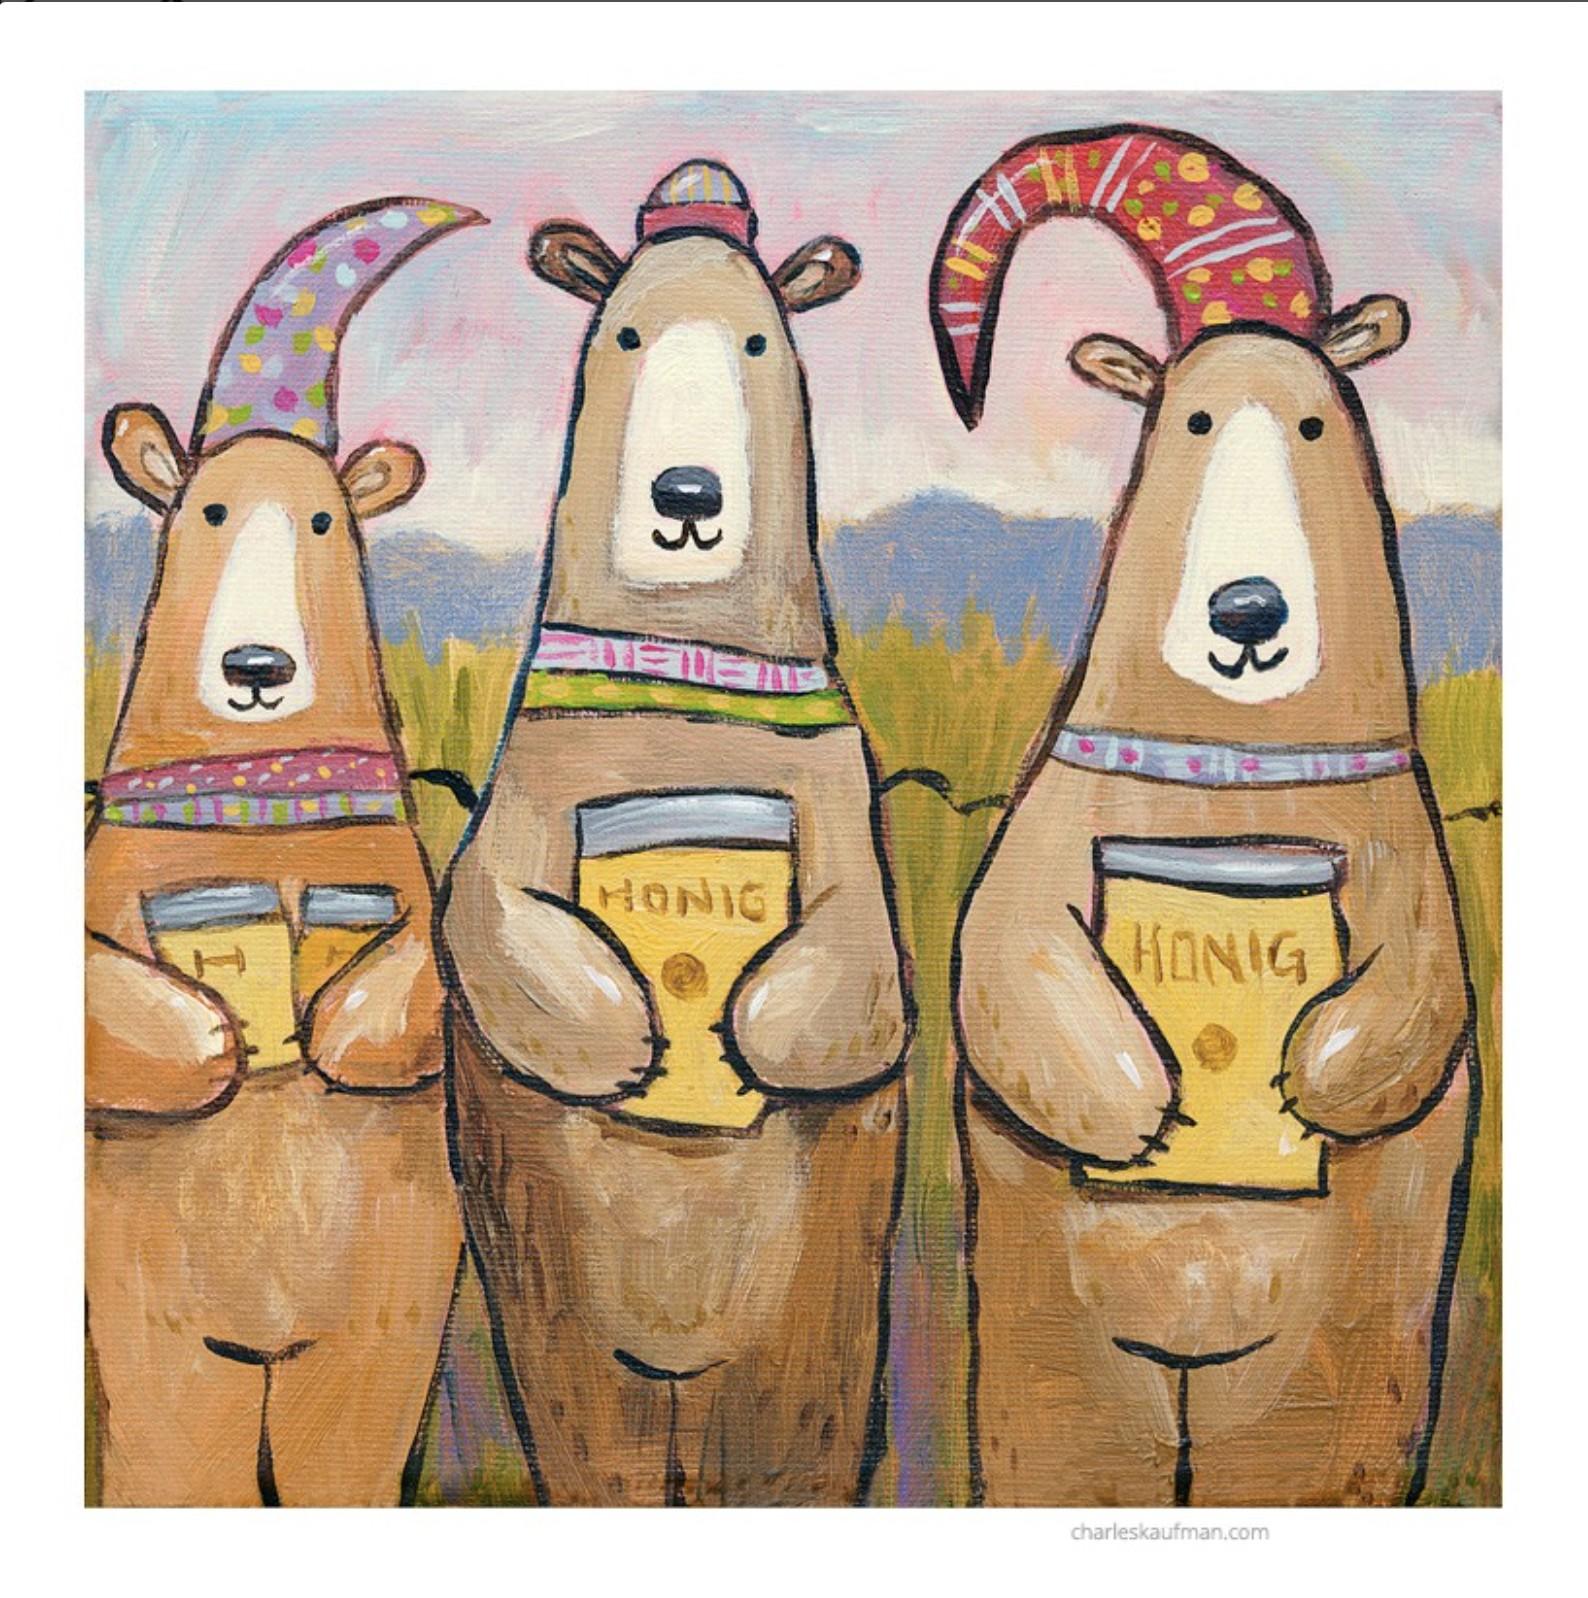 three bears and honey - Kaufmann, Charles - k-CHK402